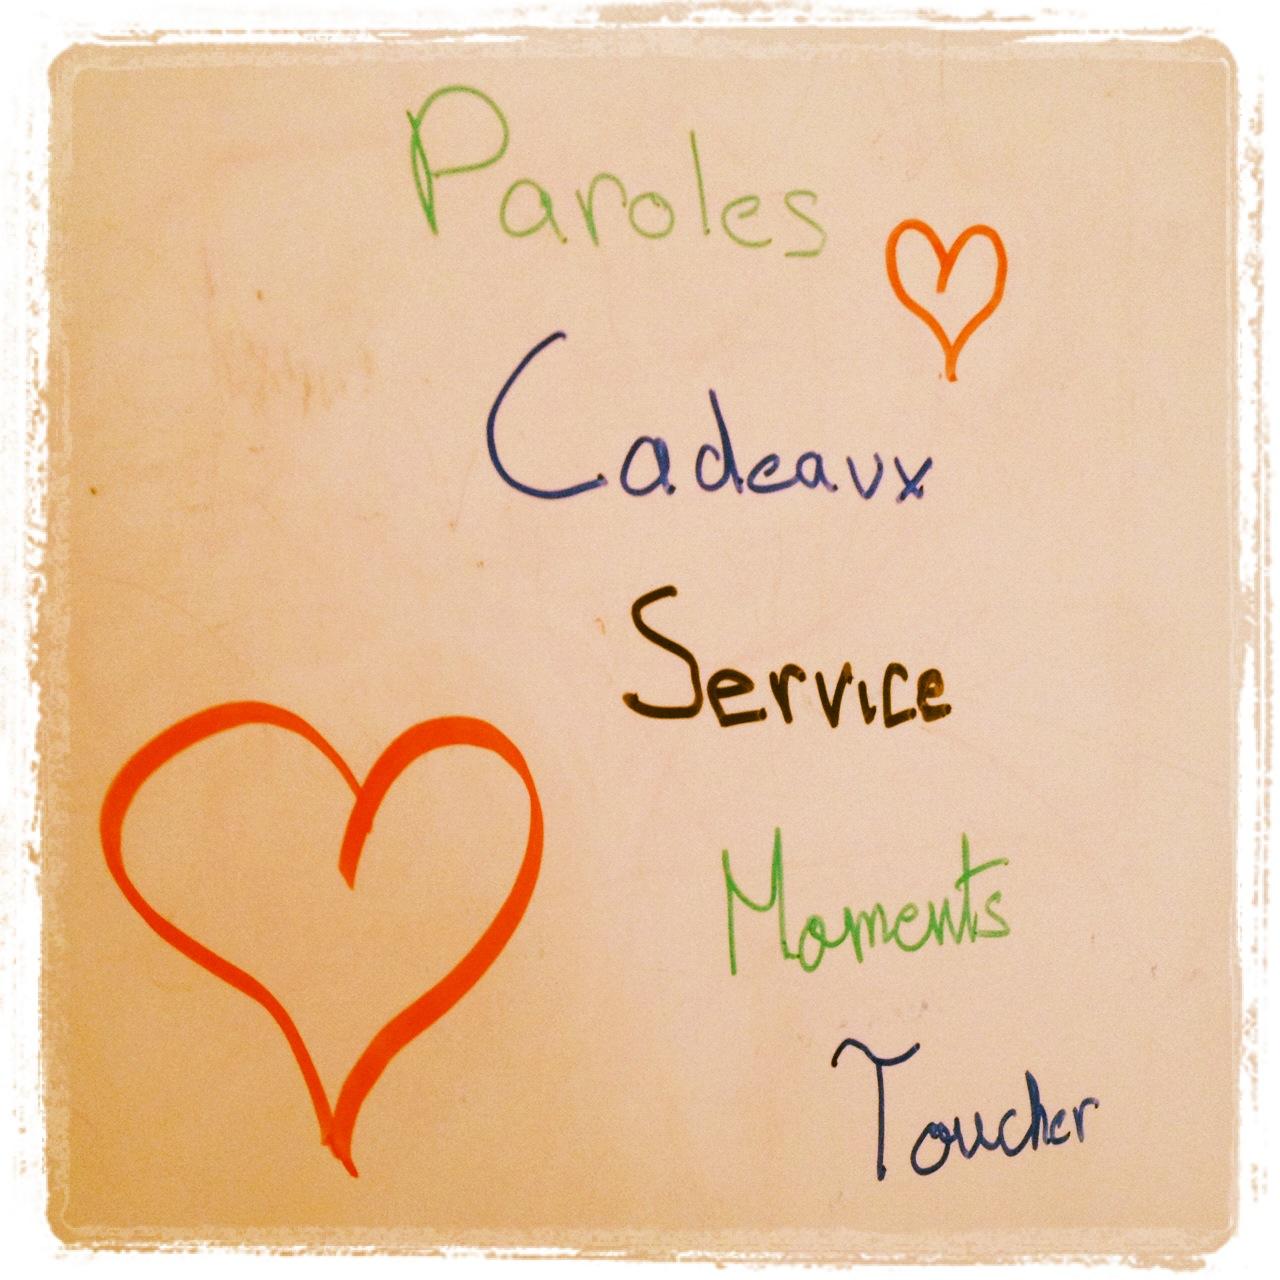 http://espritvif.com/wp-content/uploads/2012/07/5-langages-amour.jpg